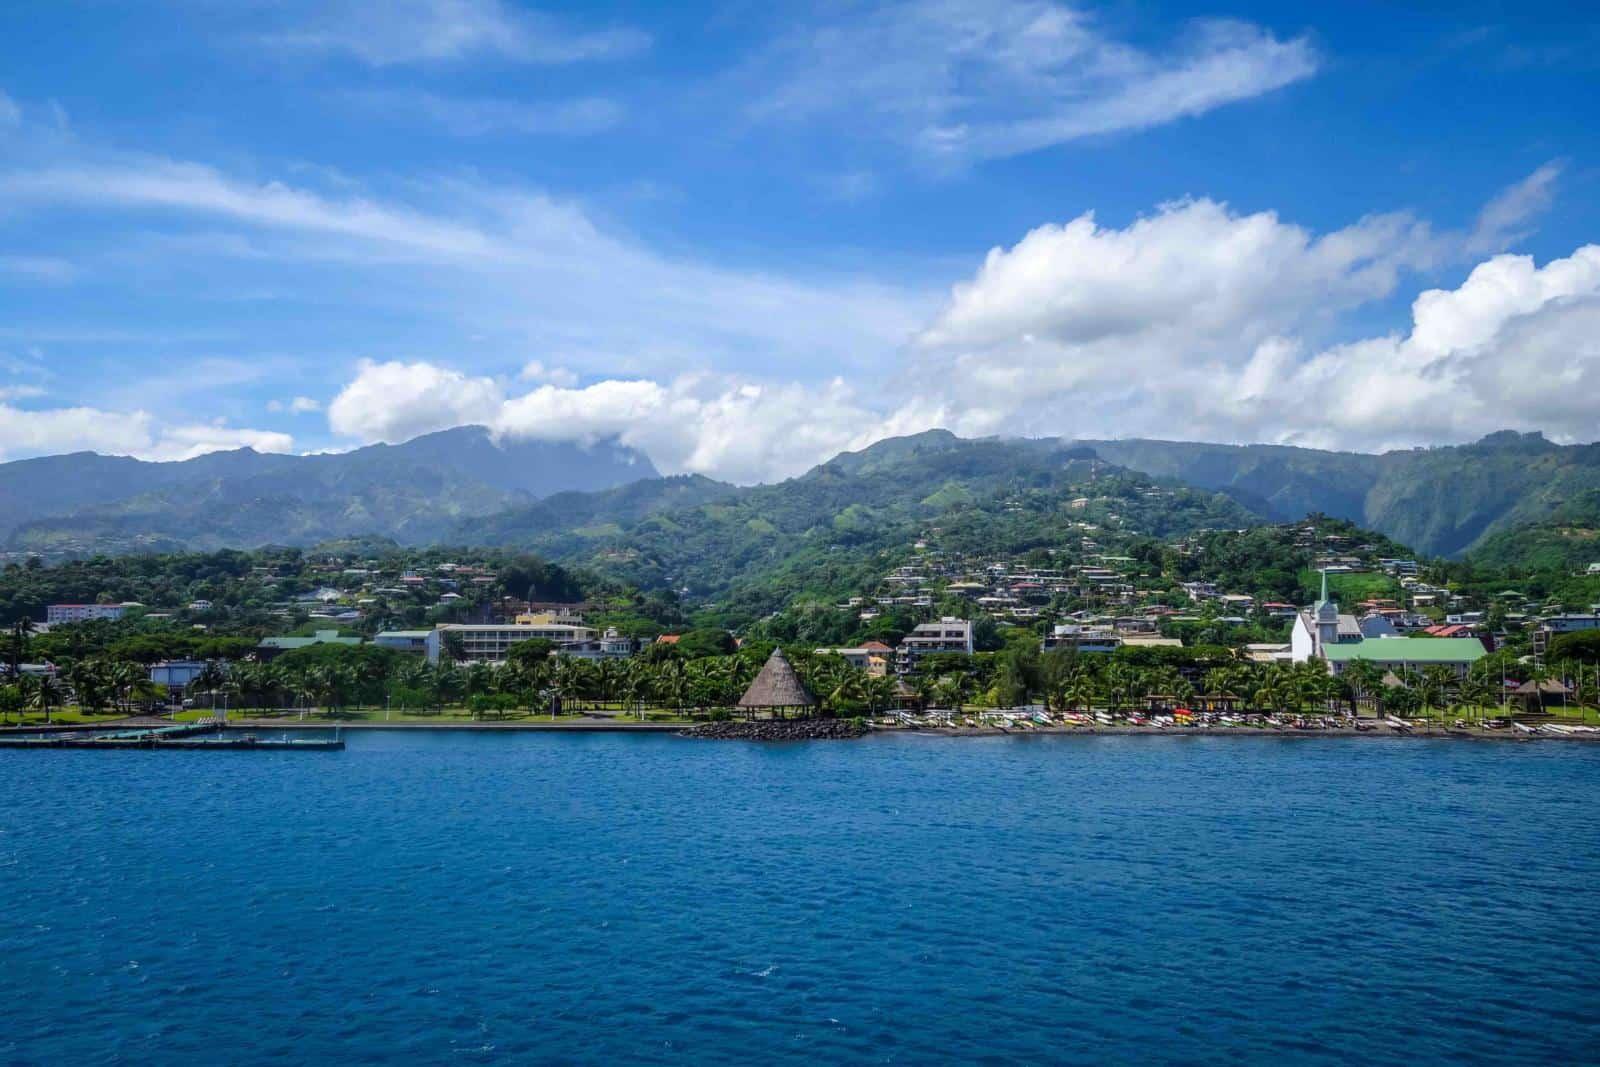 Papeete city view - is Tahiti or Bora Bora or Moorea the best tropical paradise